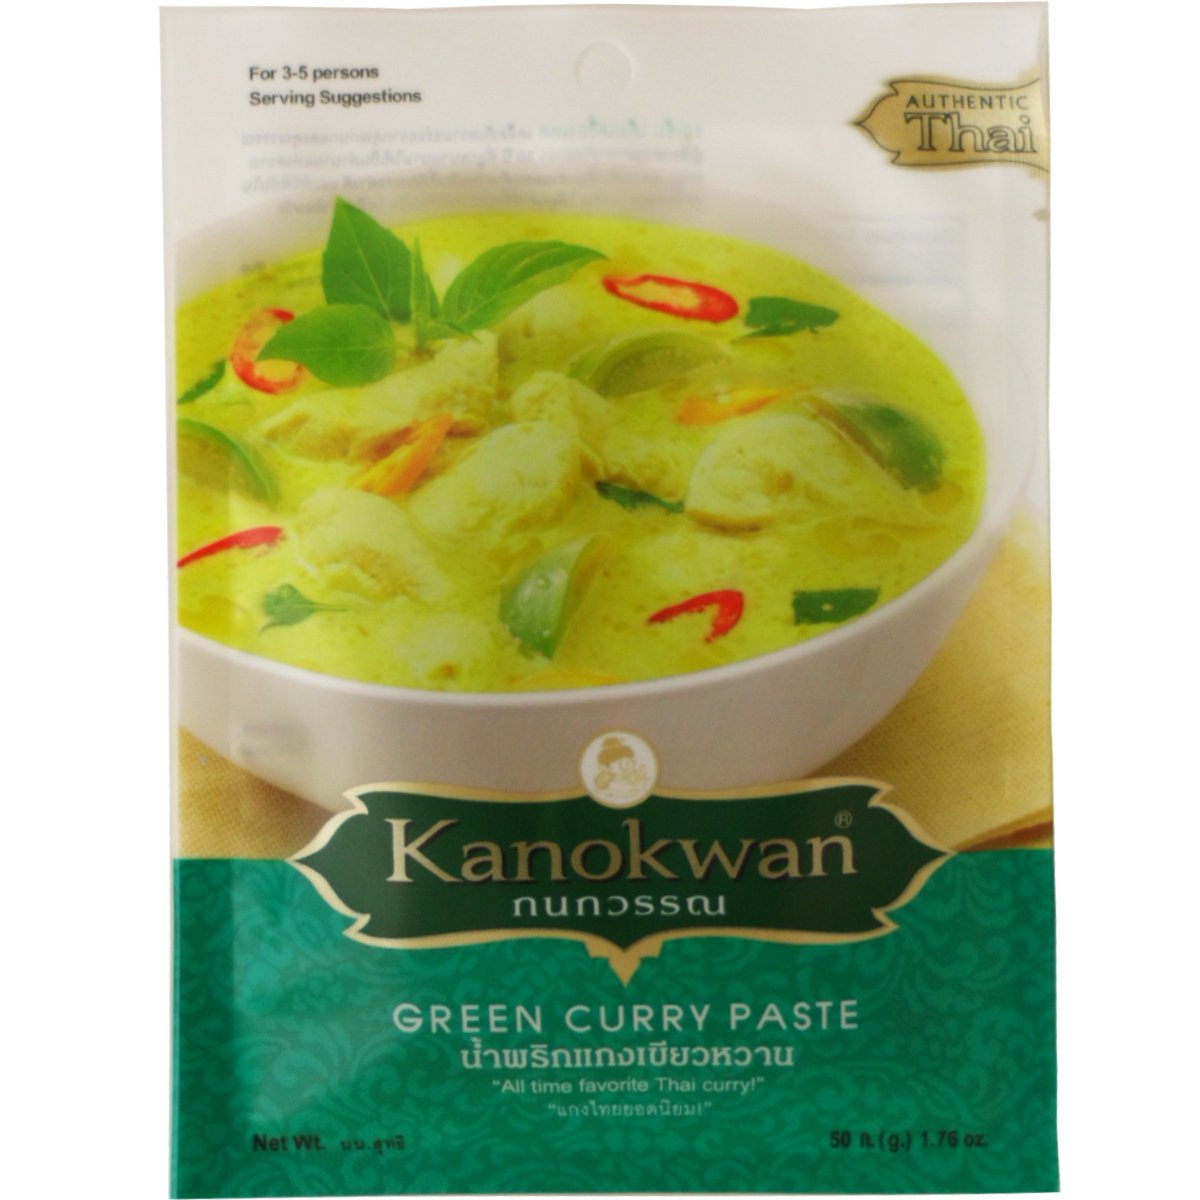 Green Curry Paste (Kaeng Keaw Wan) Thai Authentic Herbal Food Net Wt 50 G (1.76 Oz.) Kanokwan Brand X 8 Bags